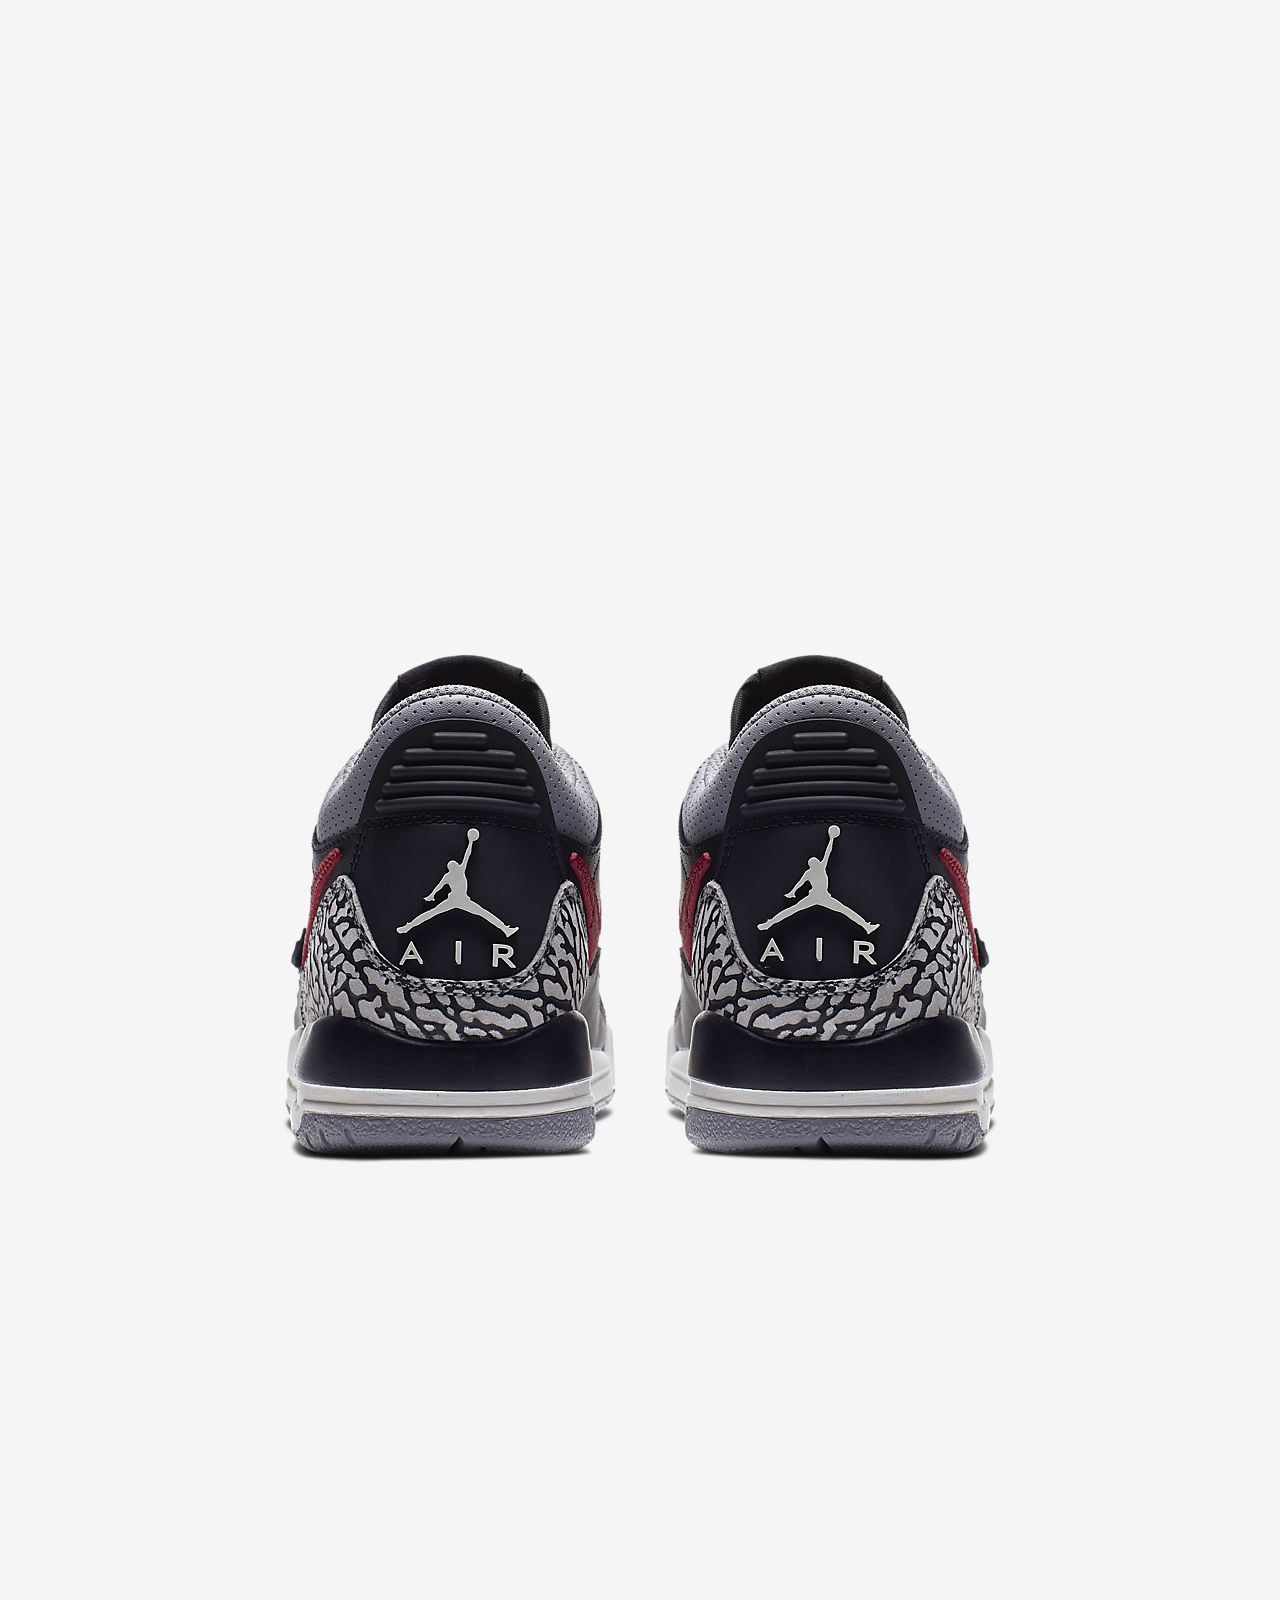 new style 9e38f 70404 ... Air Jordan Legacy 312 Low Schuh für ältere Kinder